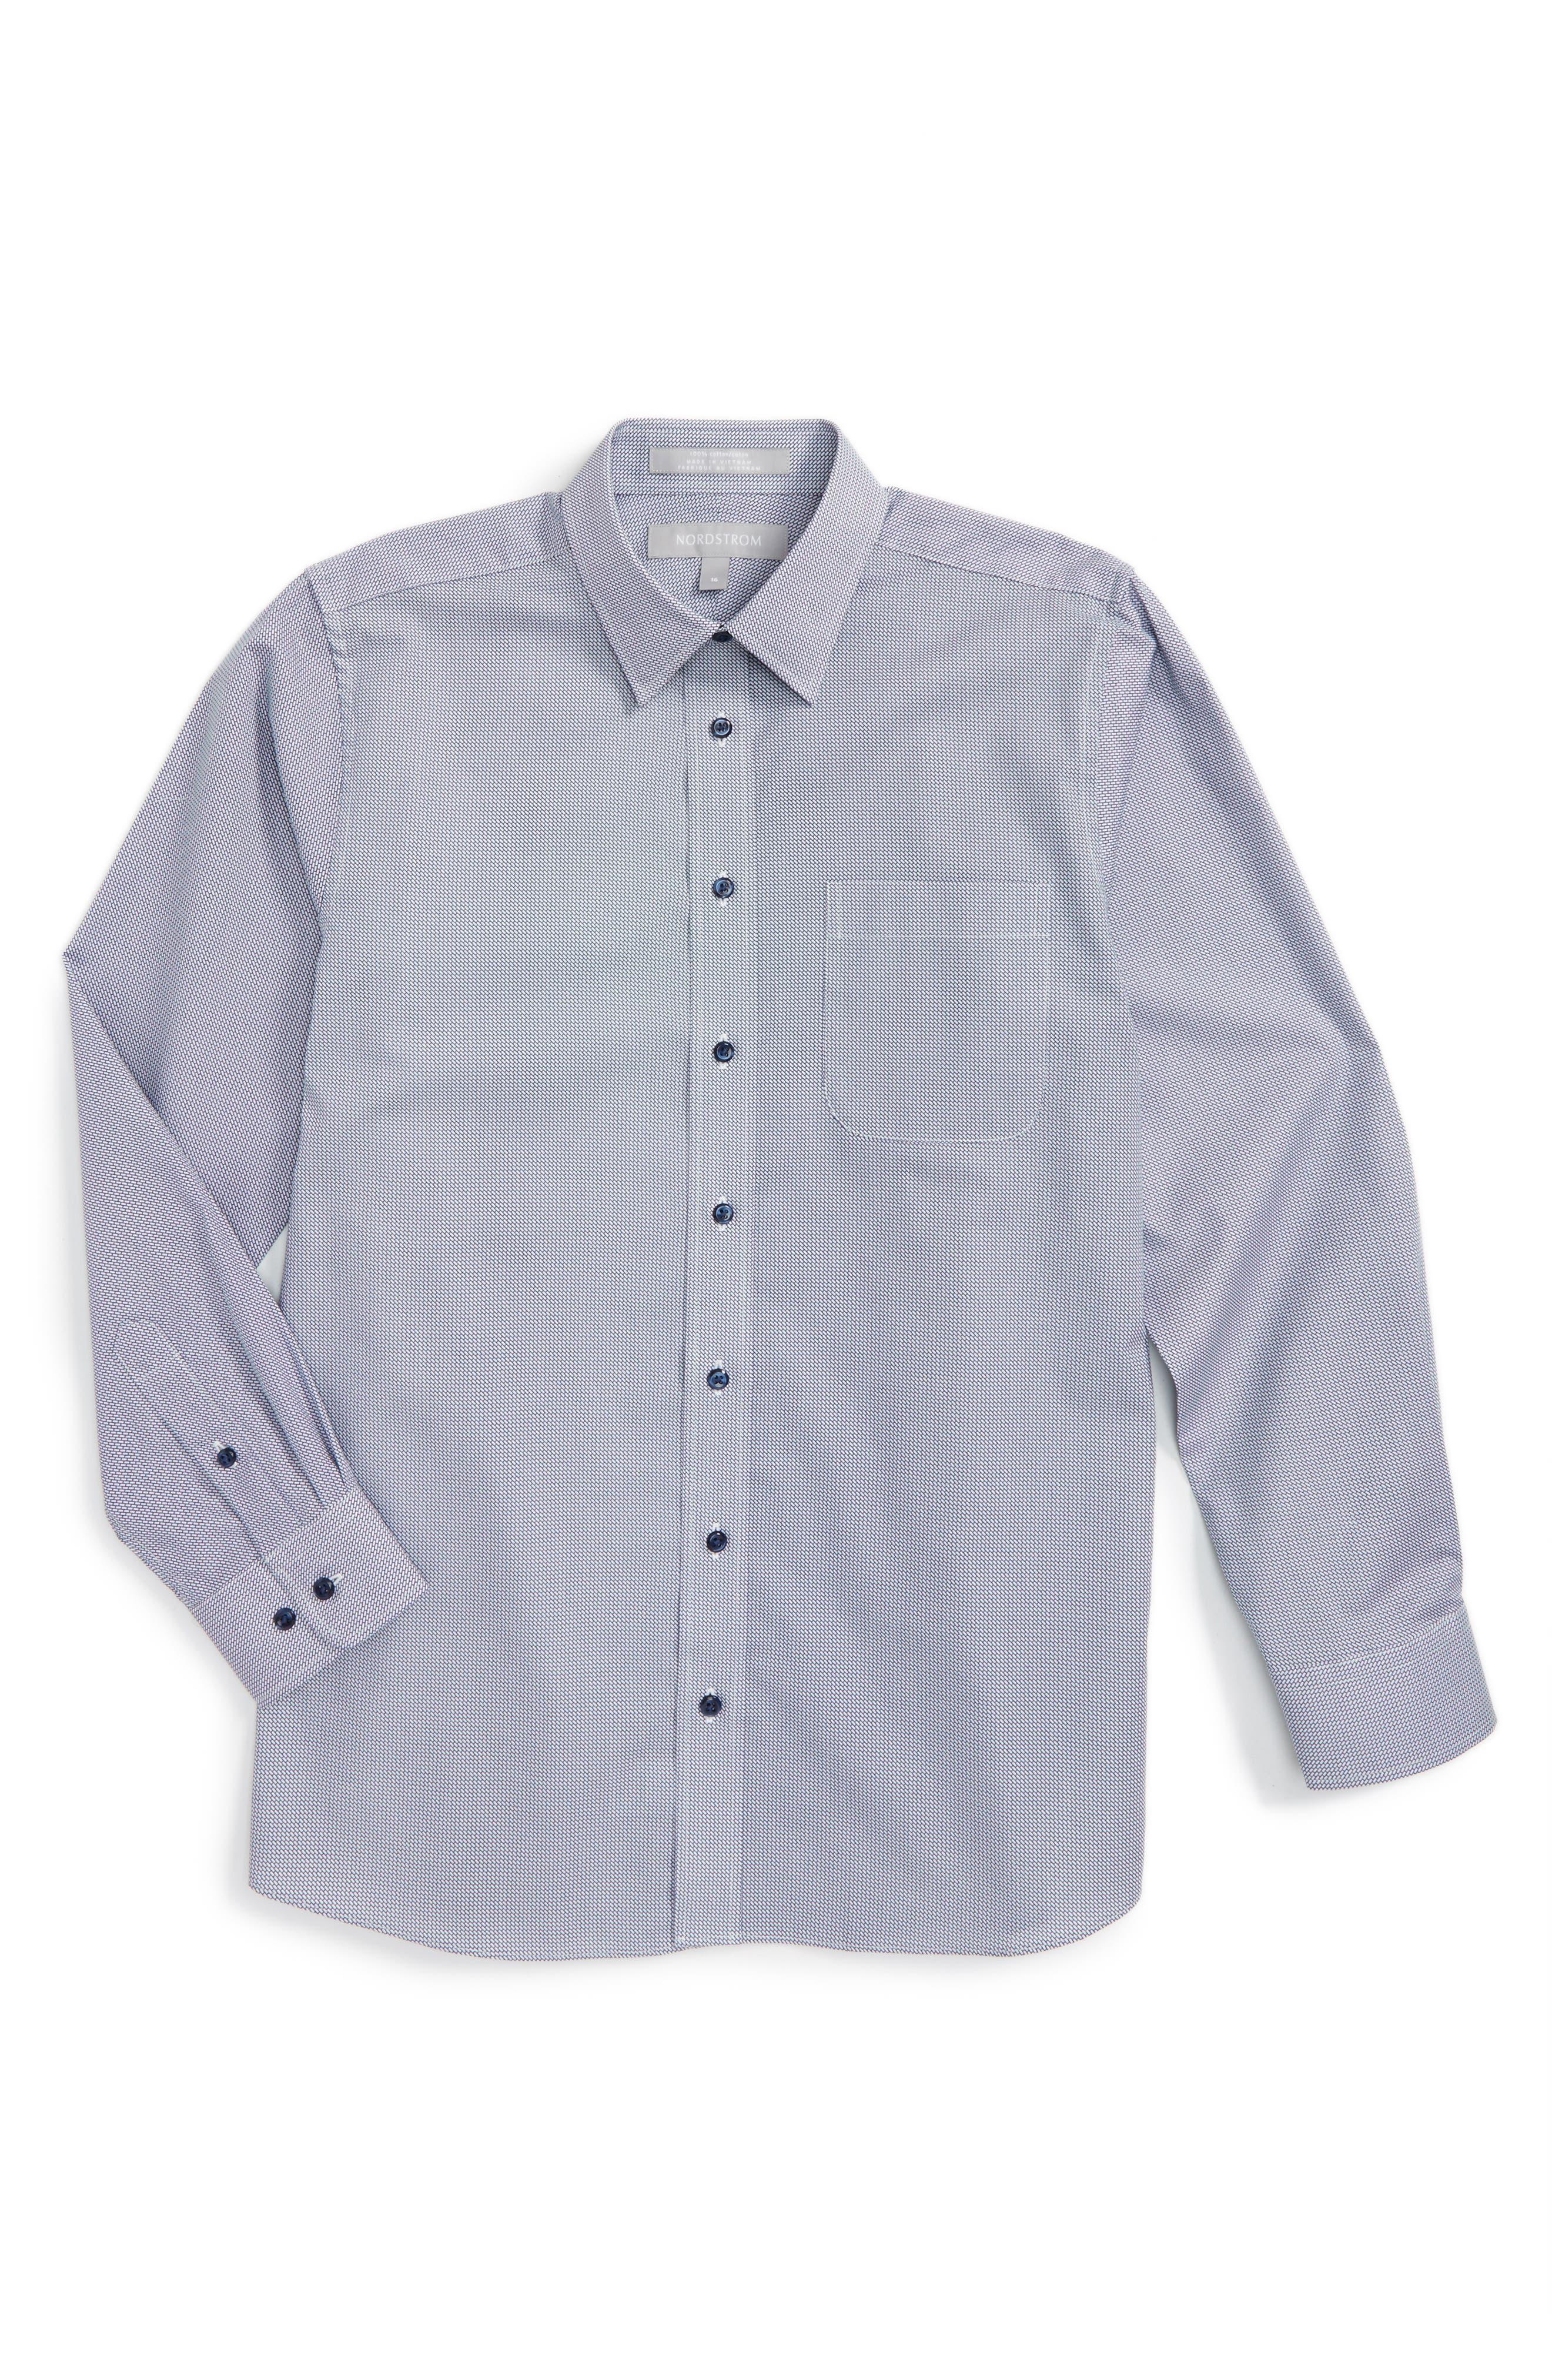 Nordstrom Neat Cotton Poplin Dress Shirt (Big Boys)